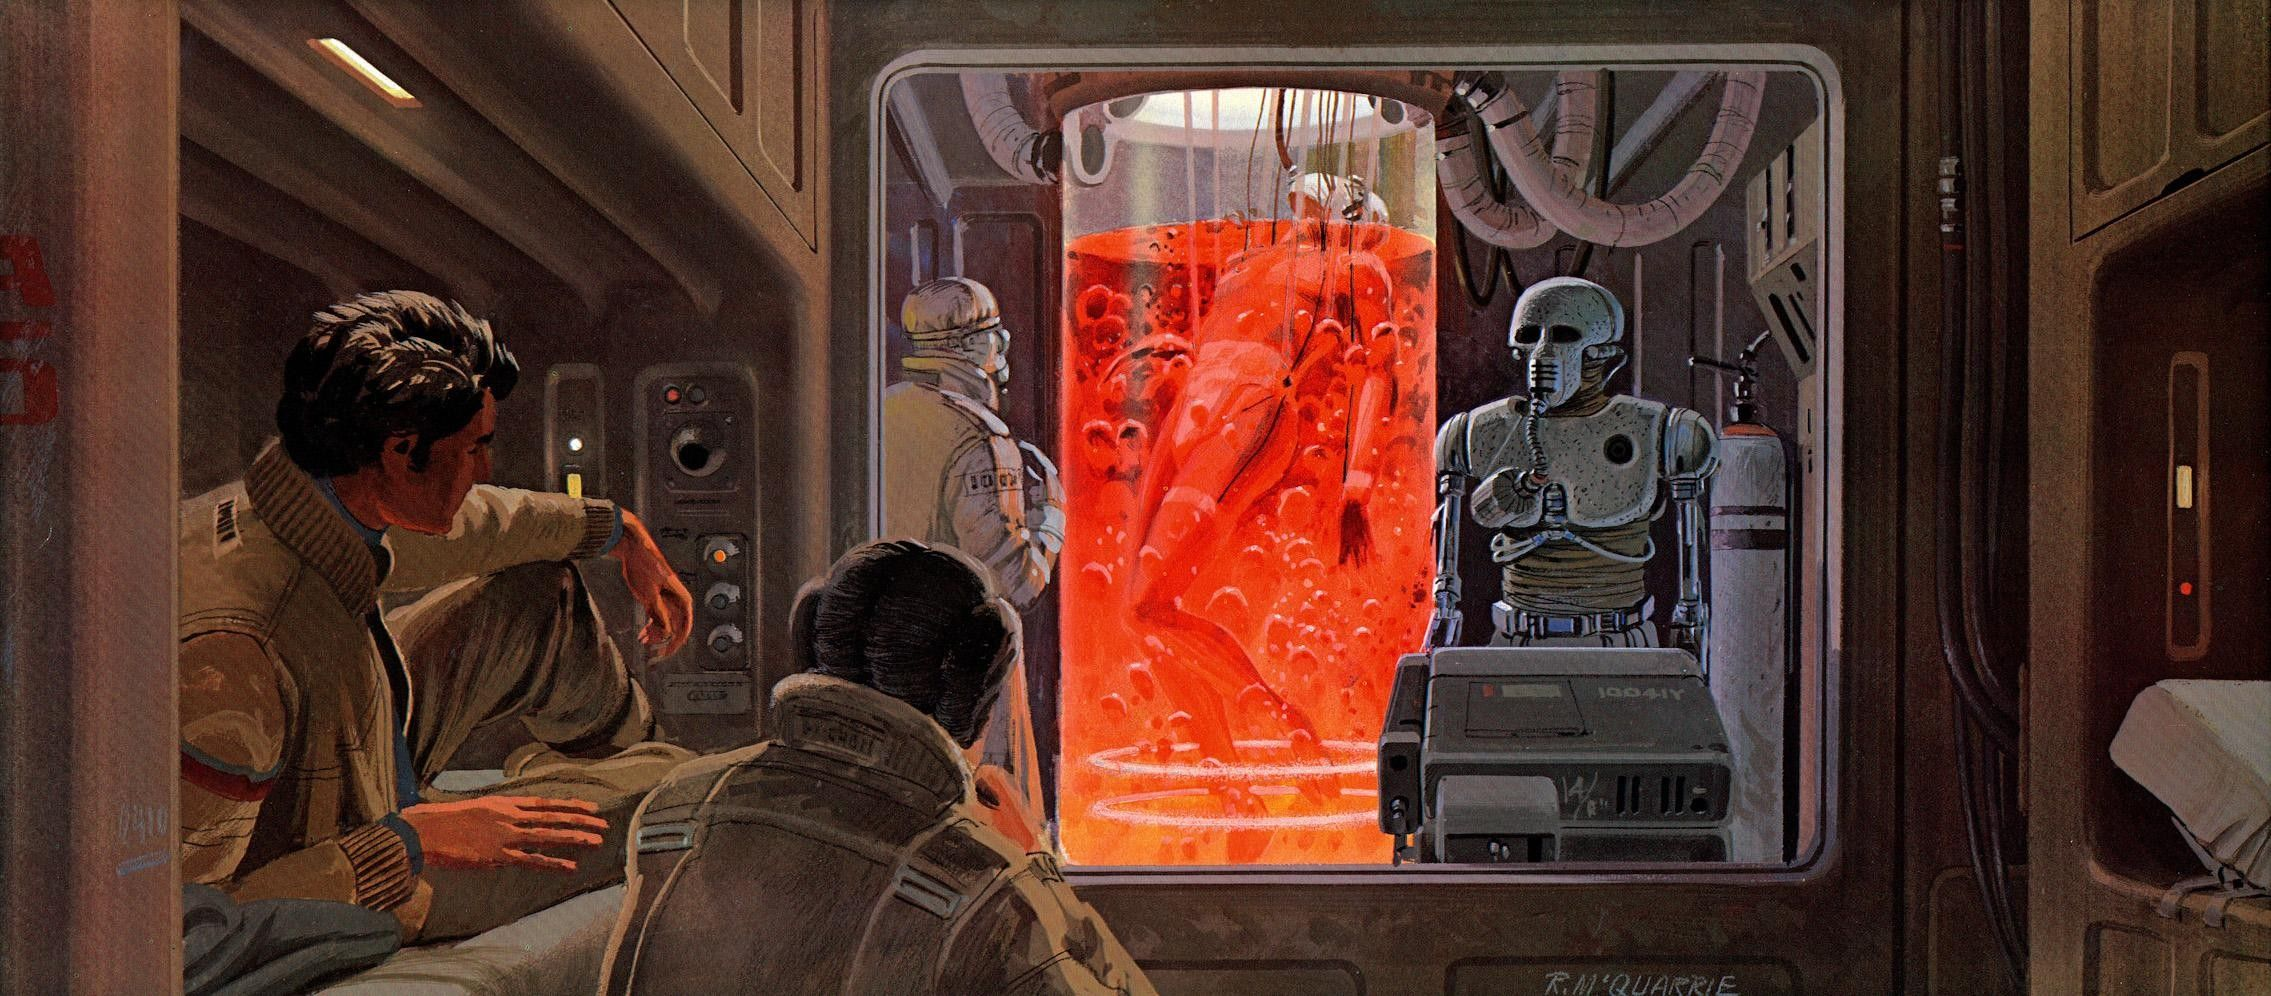 Star Wars Stormtroopers Fantasy Art Artwork Bwing Down: Ralph Mcquarrie Star Wars Concept Art Wallpaper Star Wars